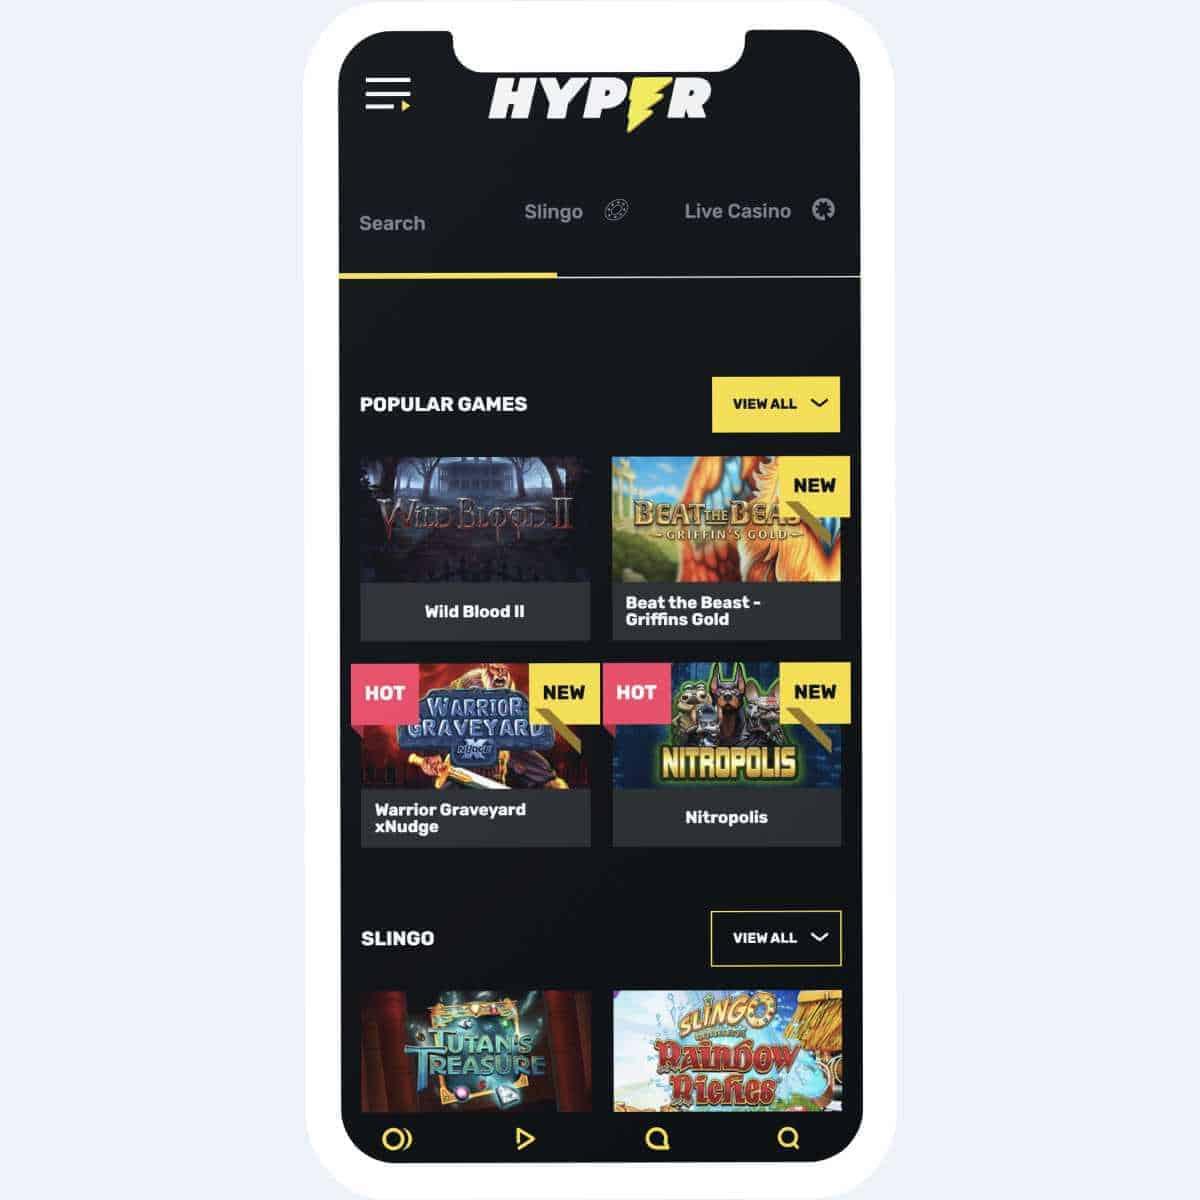 hyper casino games mobile